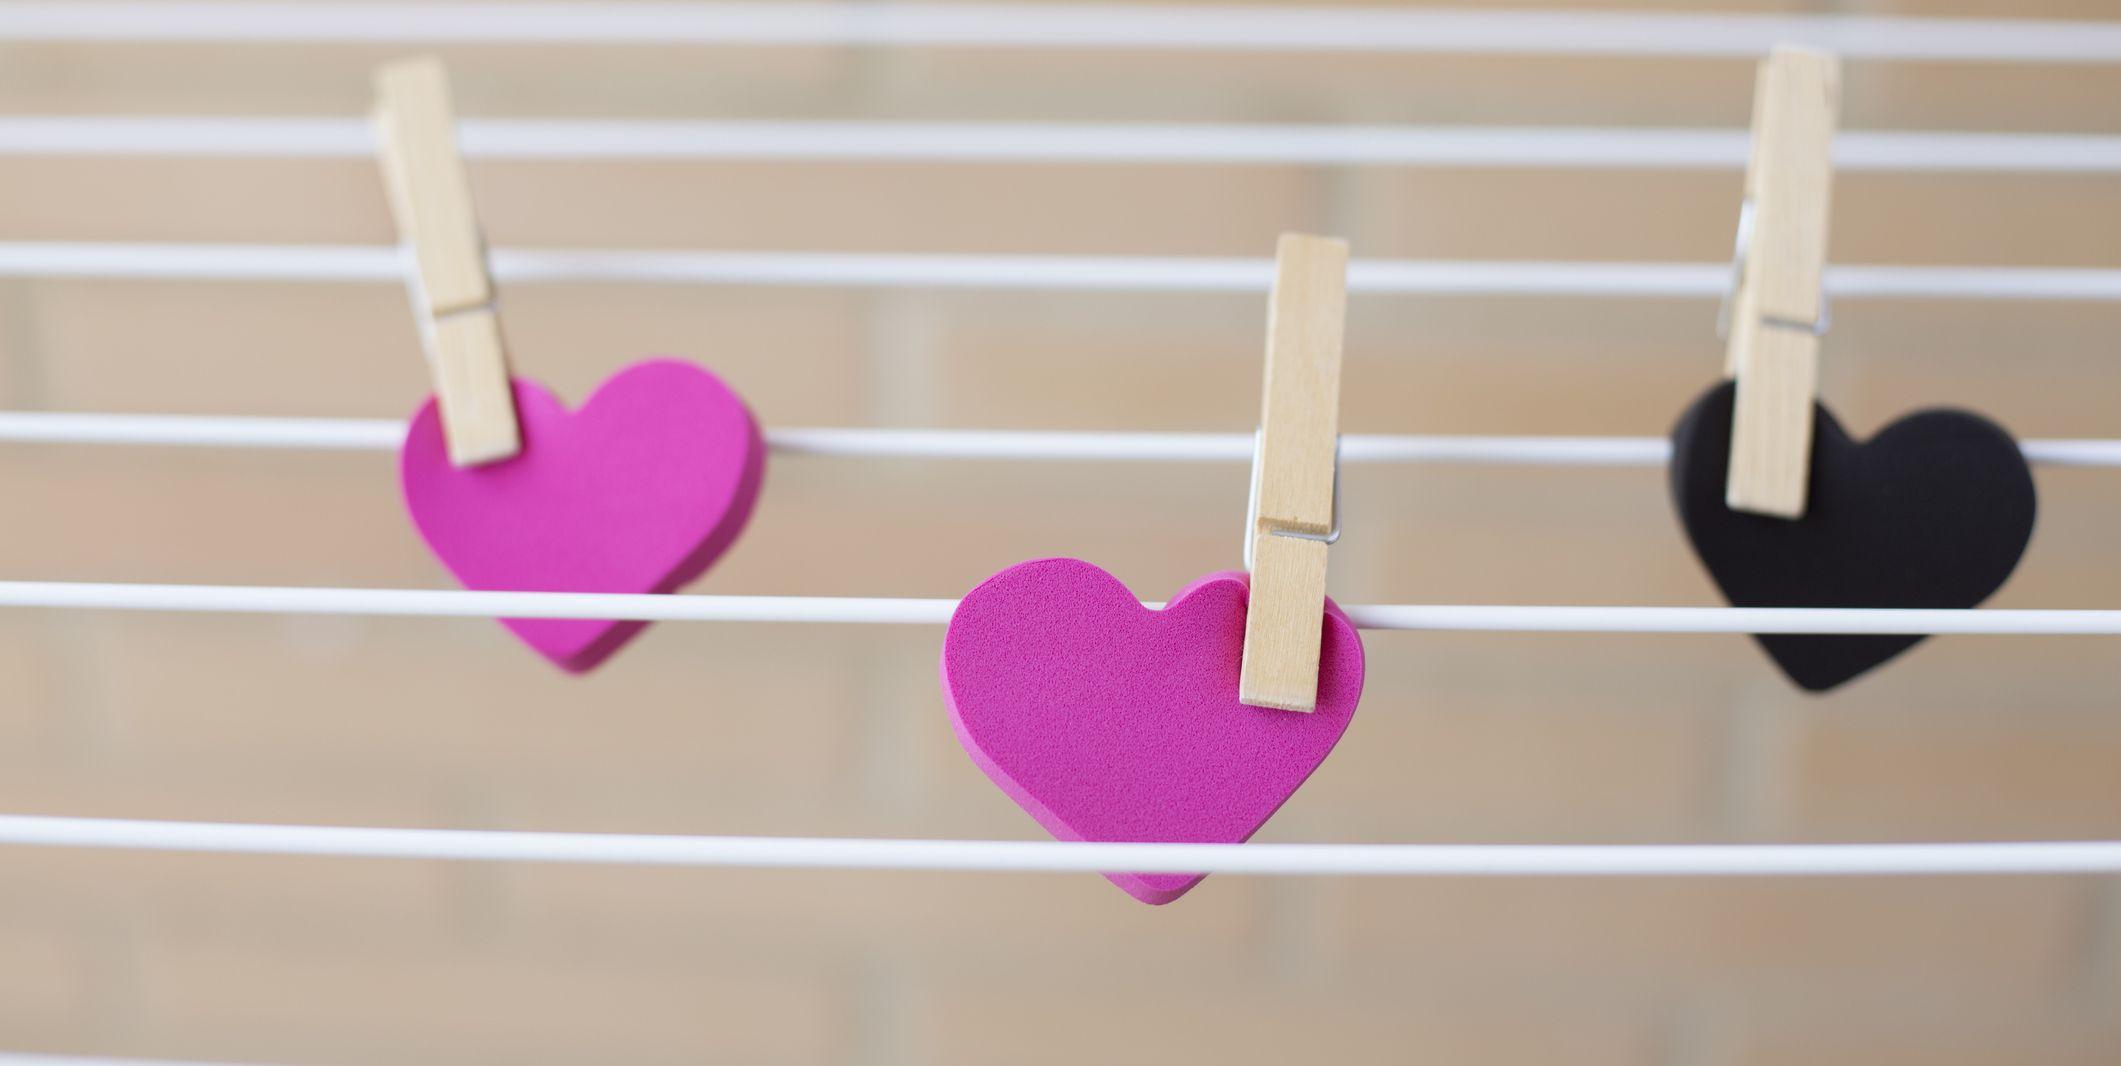 Hearts lying on a clothesline